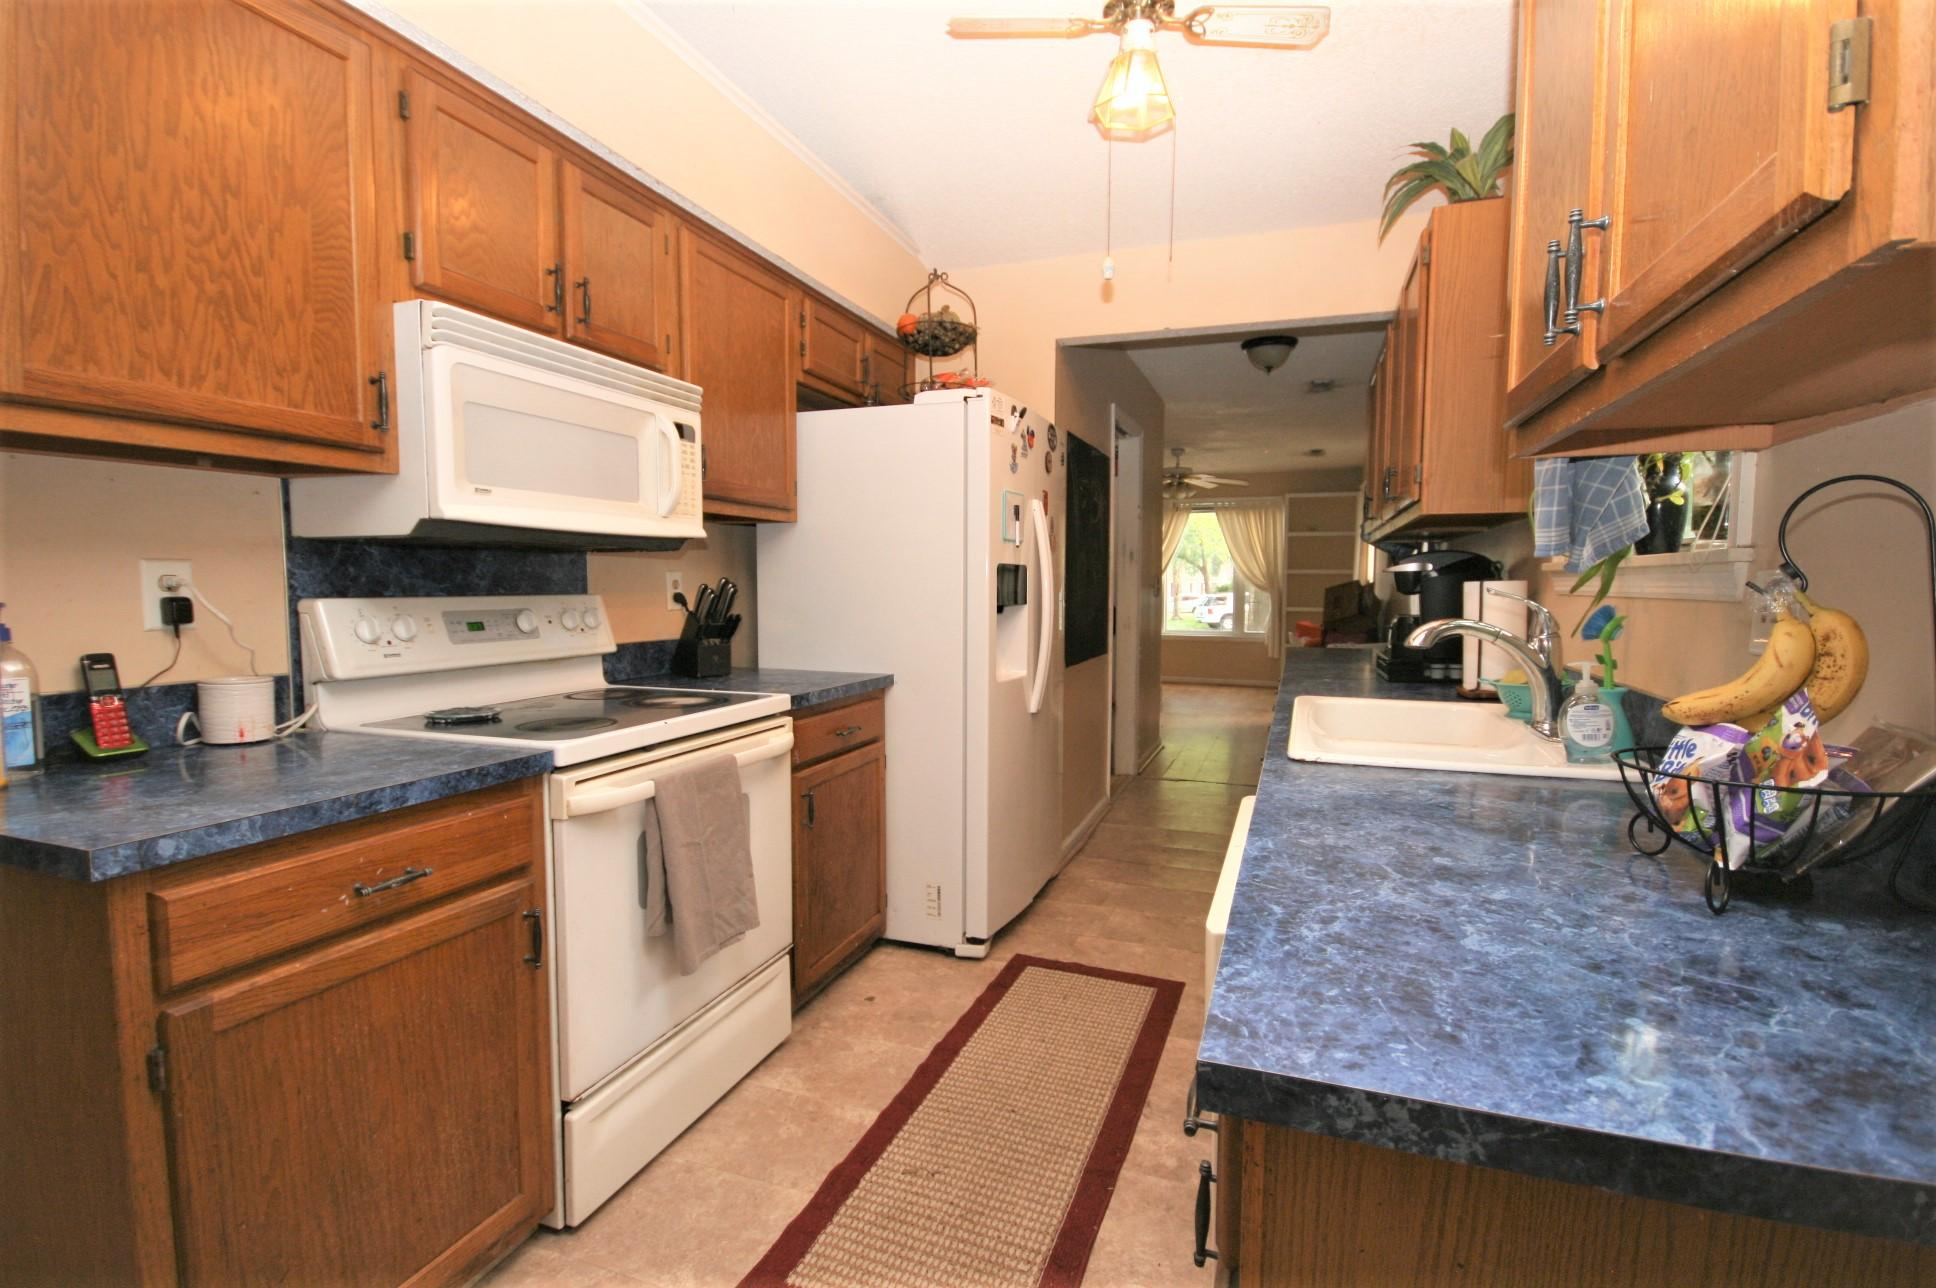 Crichton Parish Homes For Sale - 110 Ruston, Summerville, SC - 6